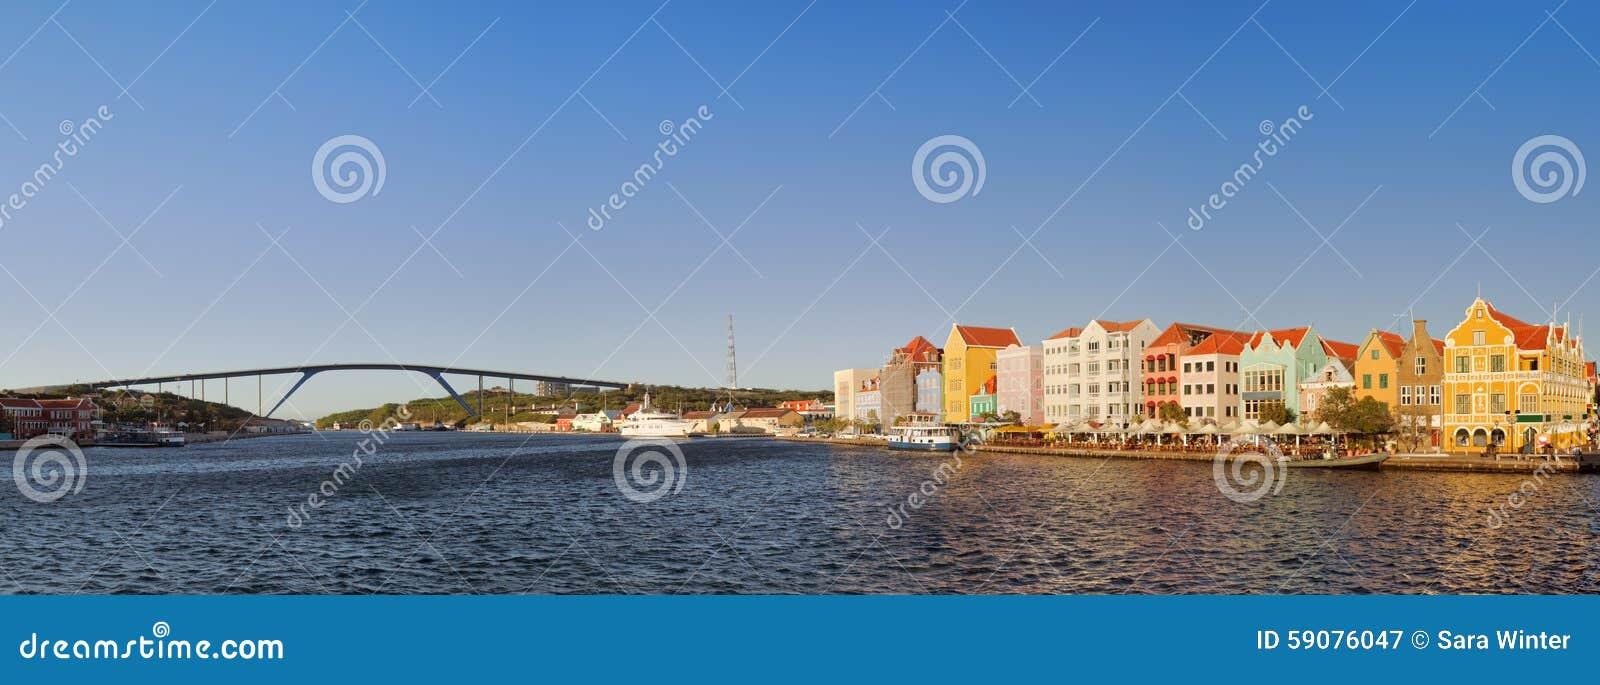 Costa y reina Juliana Bridge, Willemstad, Curaçao a